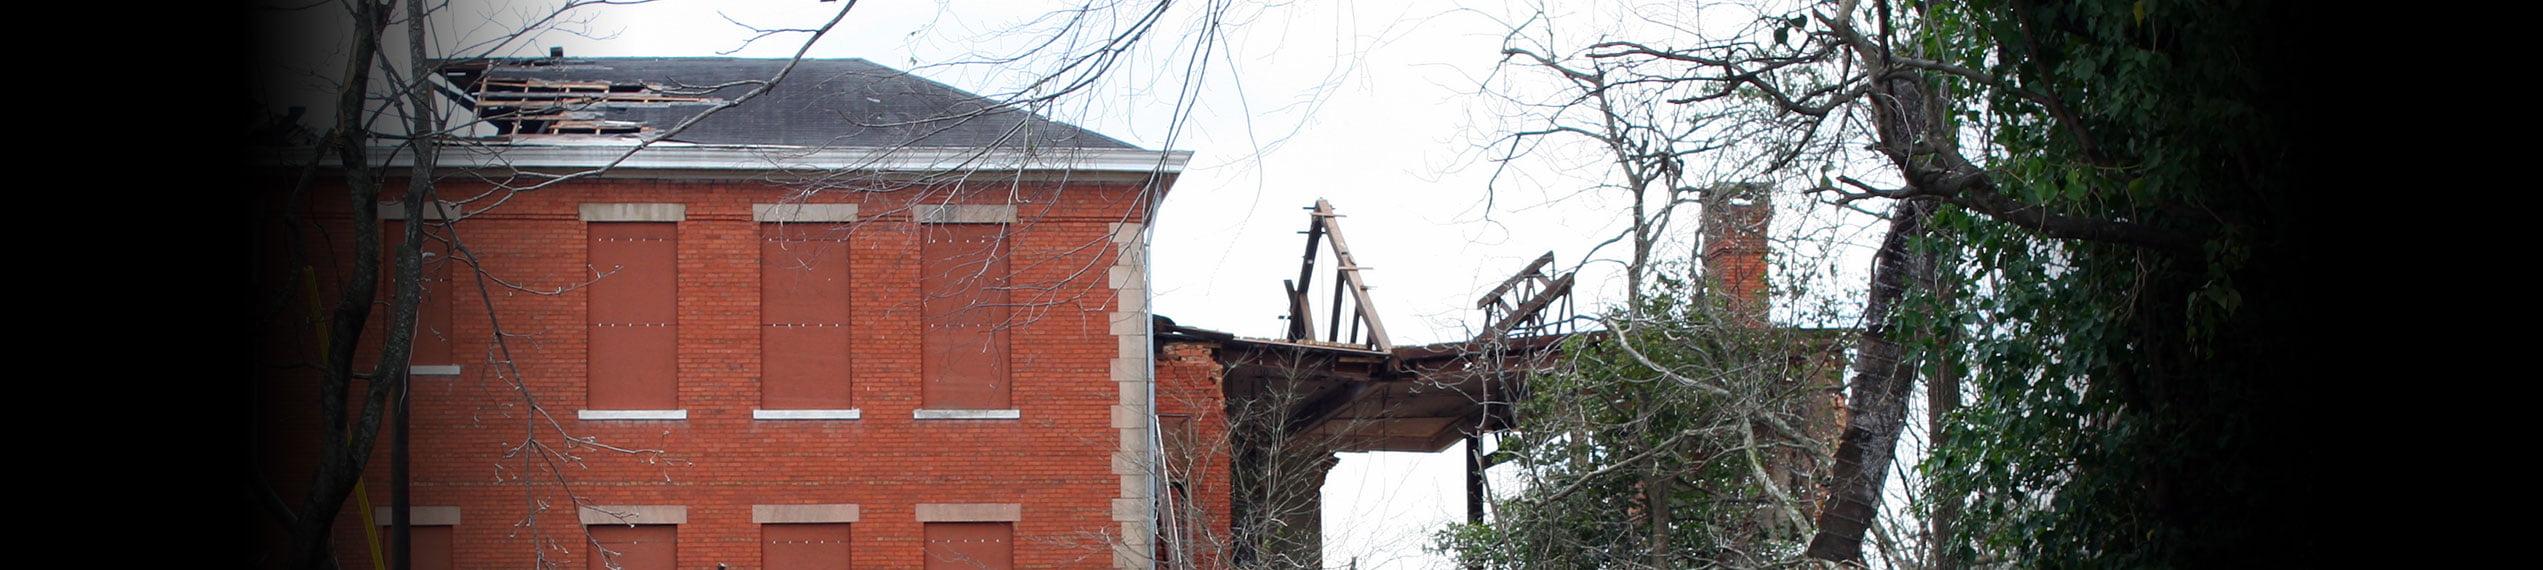 Wind & Storm Damage Repairs in Paul Davis Restoration of Alexandria/St. Cloud, MN